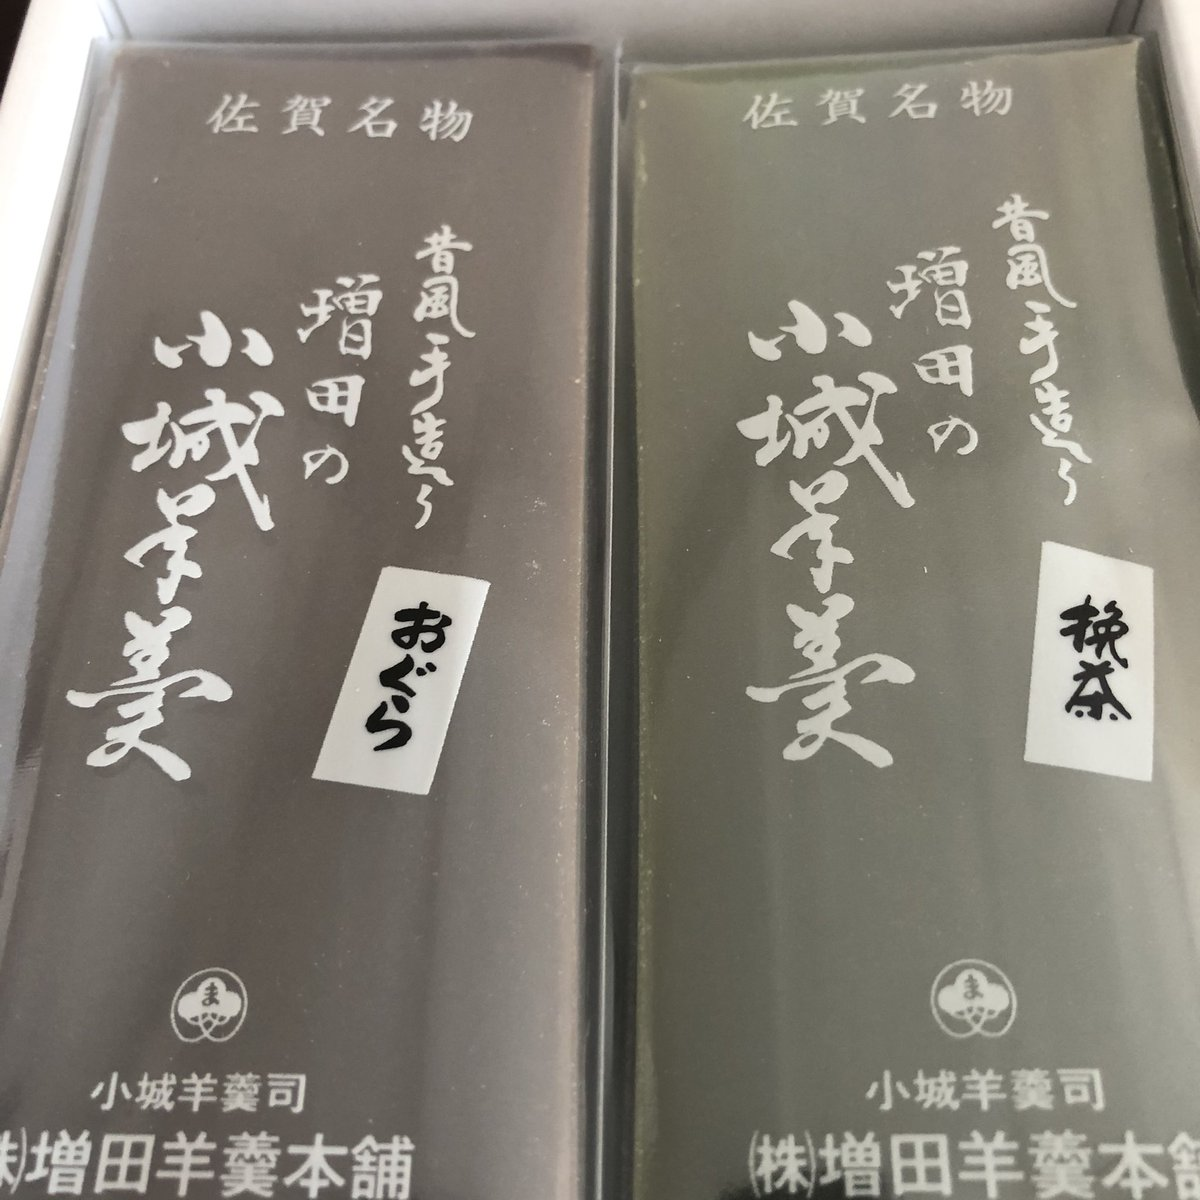 test ツイッターメディア - @aino_sazanami 何故か佐賀名物、増田の小城羊羹。選んだ理由はIRに確認中(・・;) https://t.co/tCJ5DiiwXG